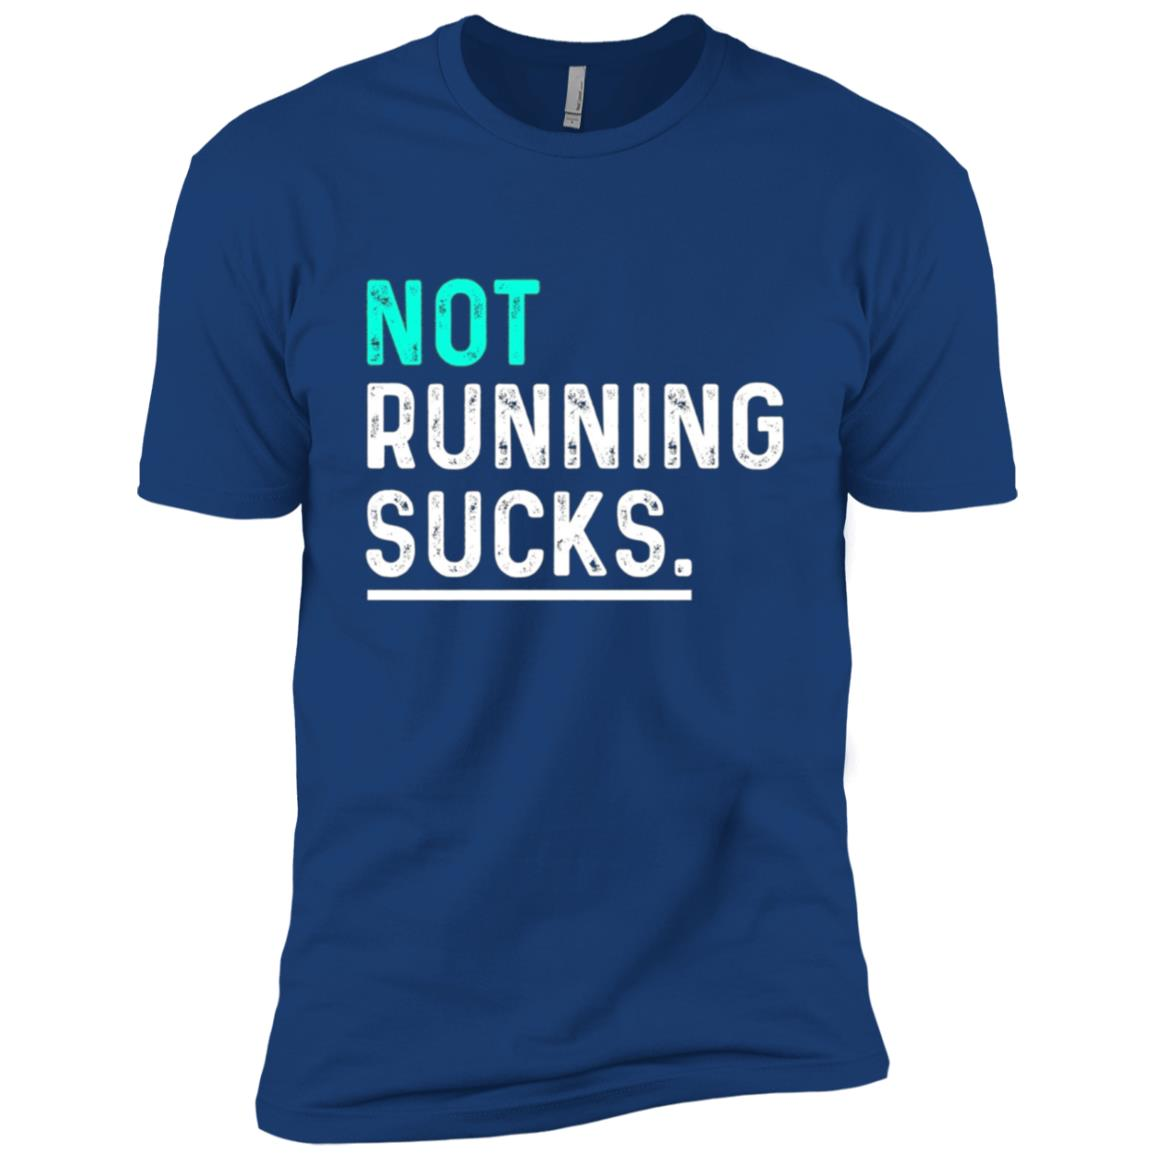 Not Running Sucks Motivational Runner's Men Short Sleeve T-Shirt